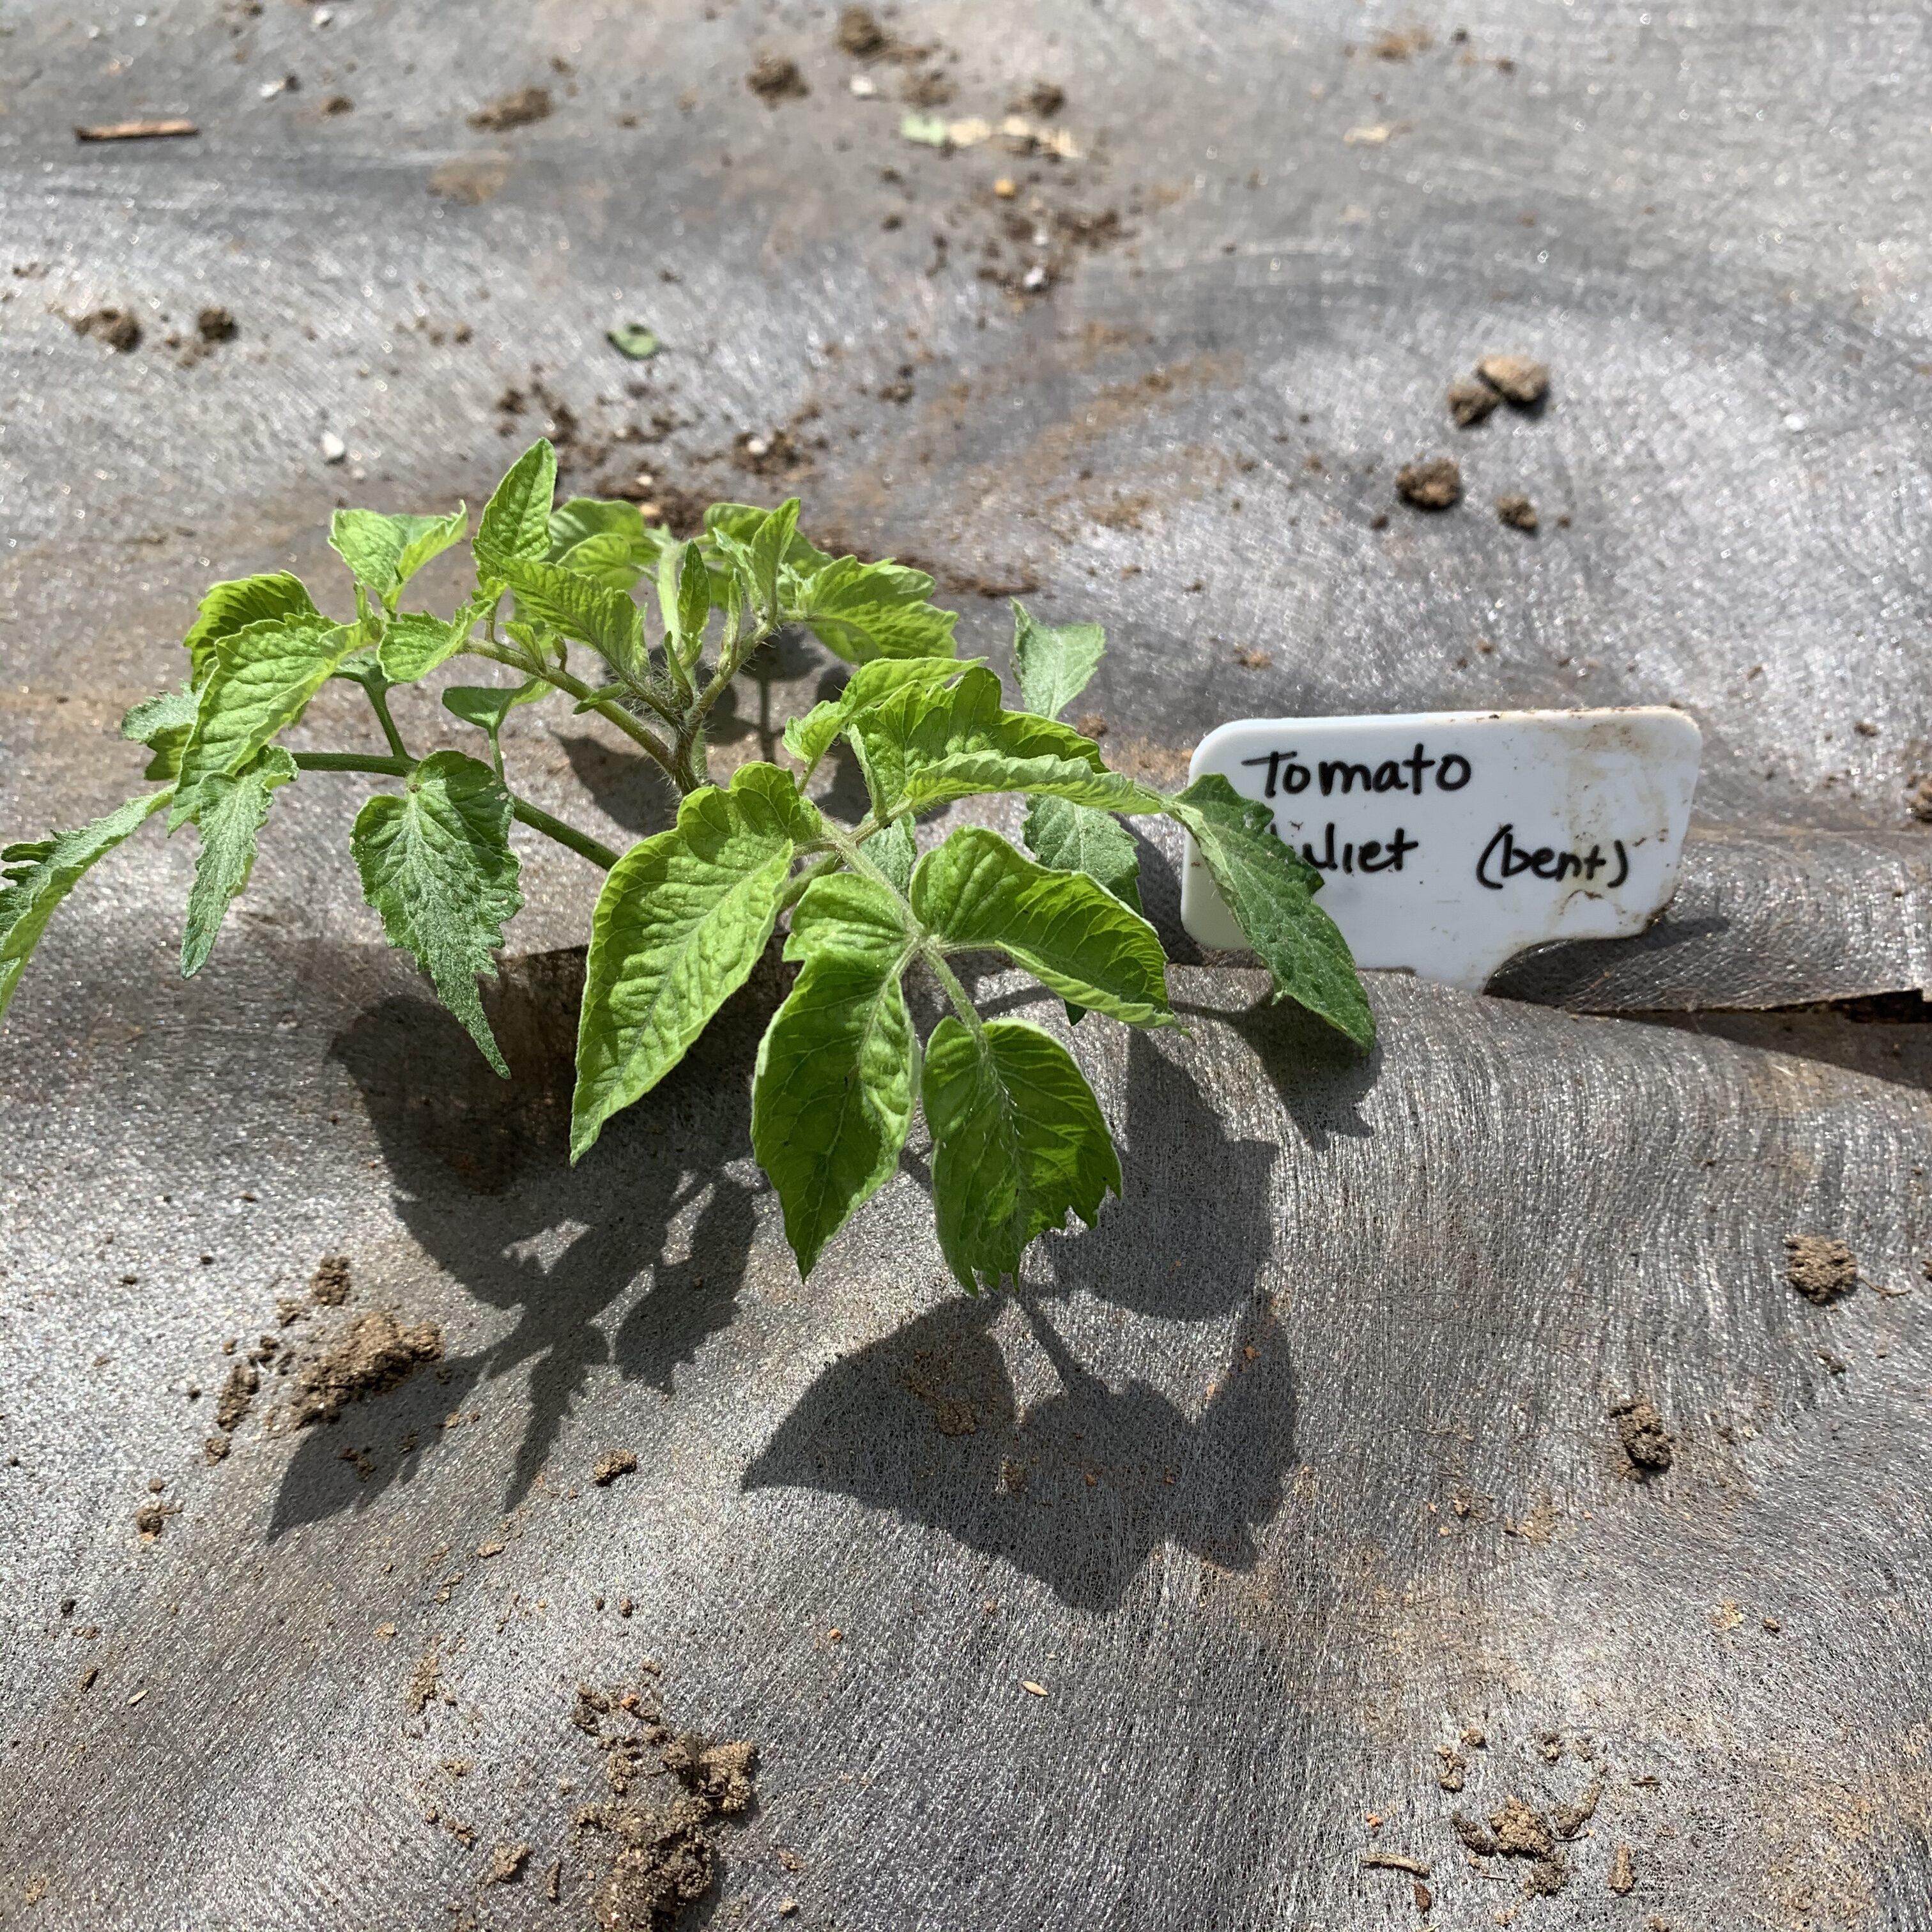 3ABF8F84 B779 45CE BB65 4BBBB908F104 Cucumbers planted!